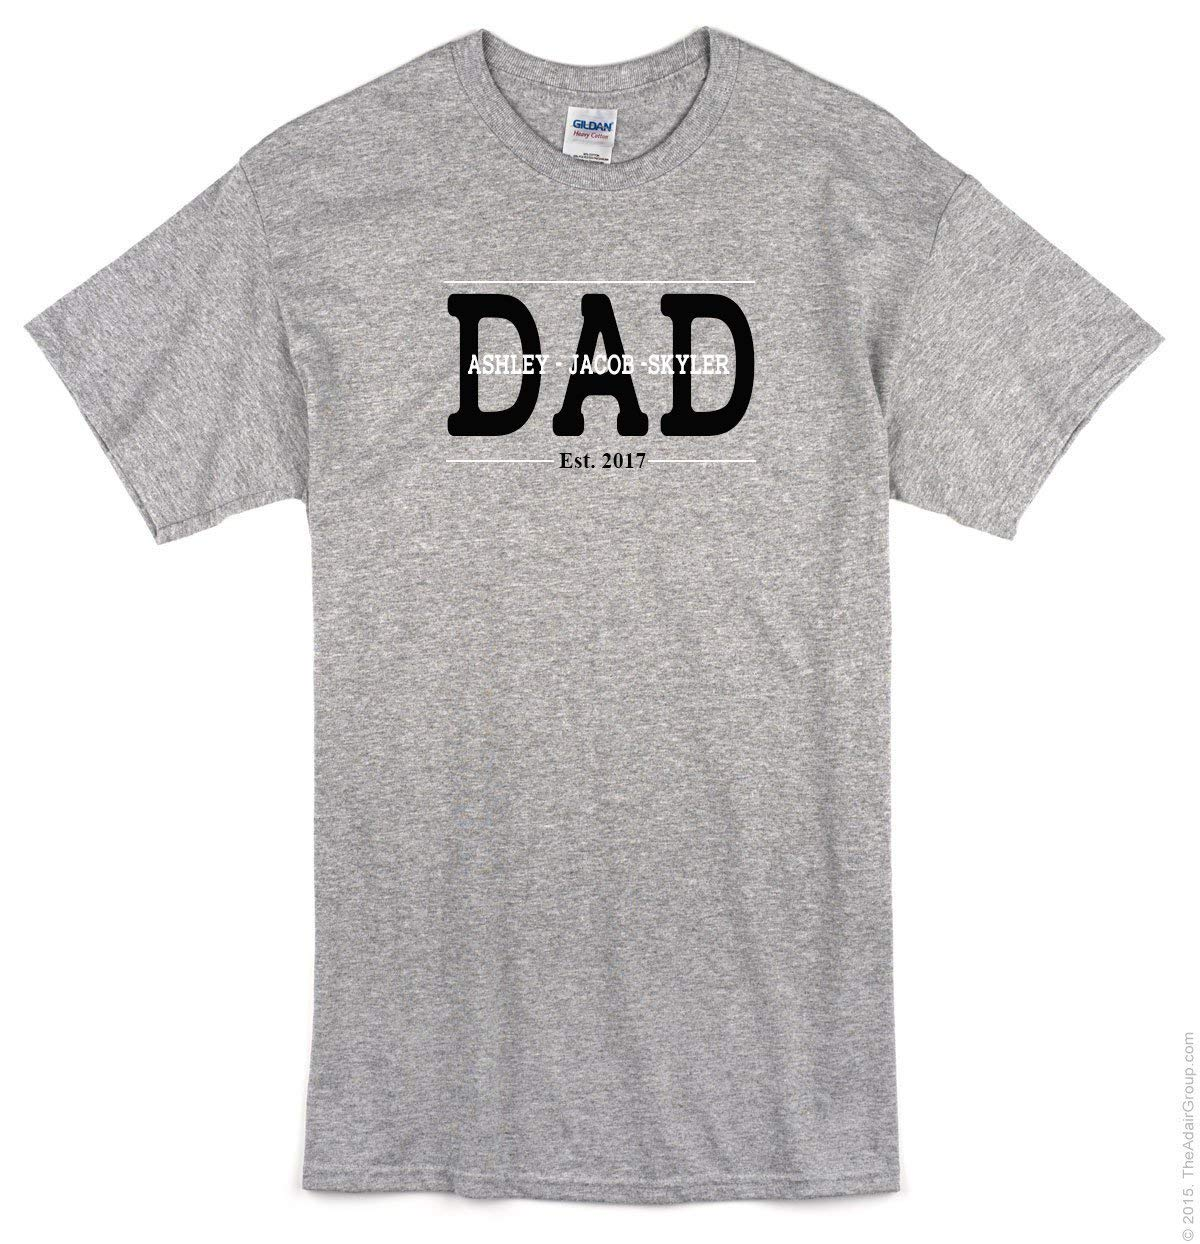 Cheap T Shirt Company Names Generator Find T Shirt Company Names